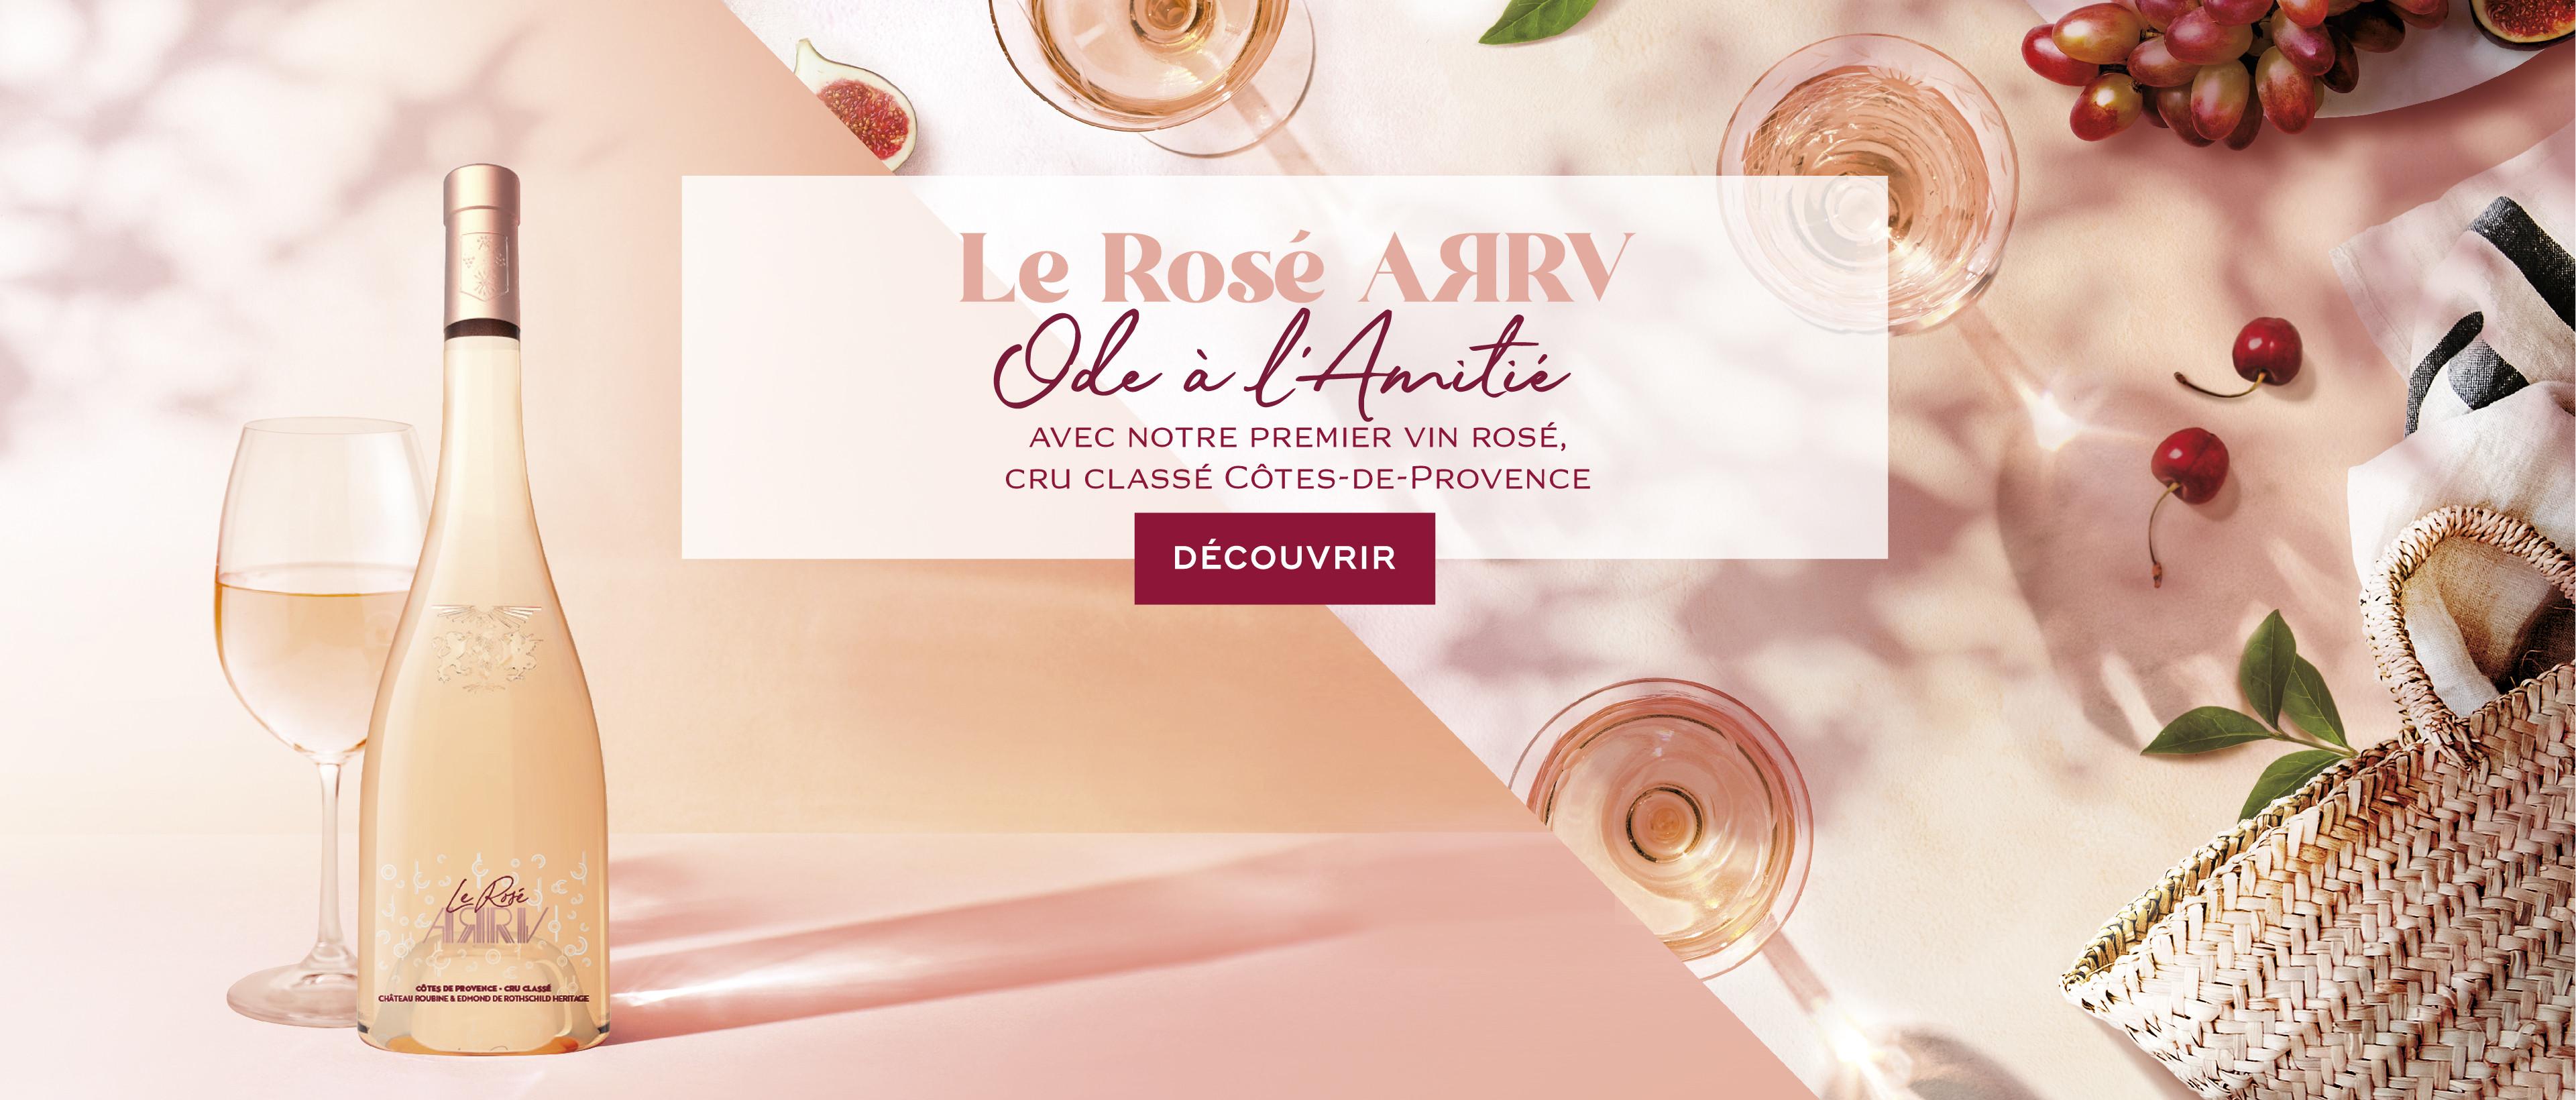 Lancement Rosé AR.RV - EDRH